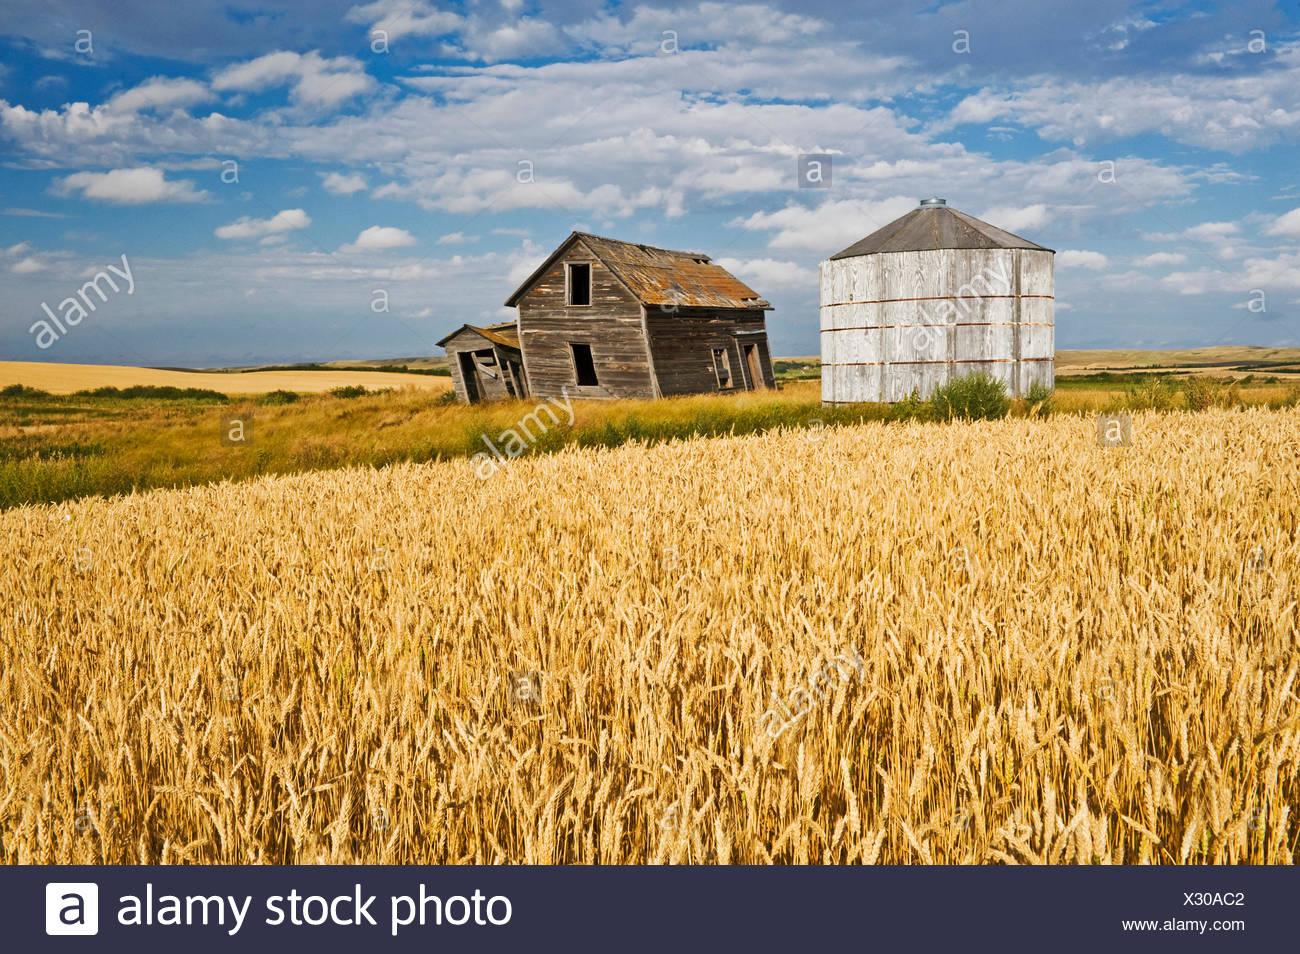 abandoned farm house and grain bin next to wheat field, near Rosetown, Saskatchewan, Canada - Stock Image